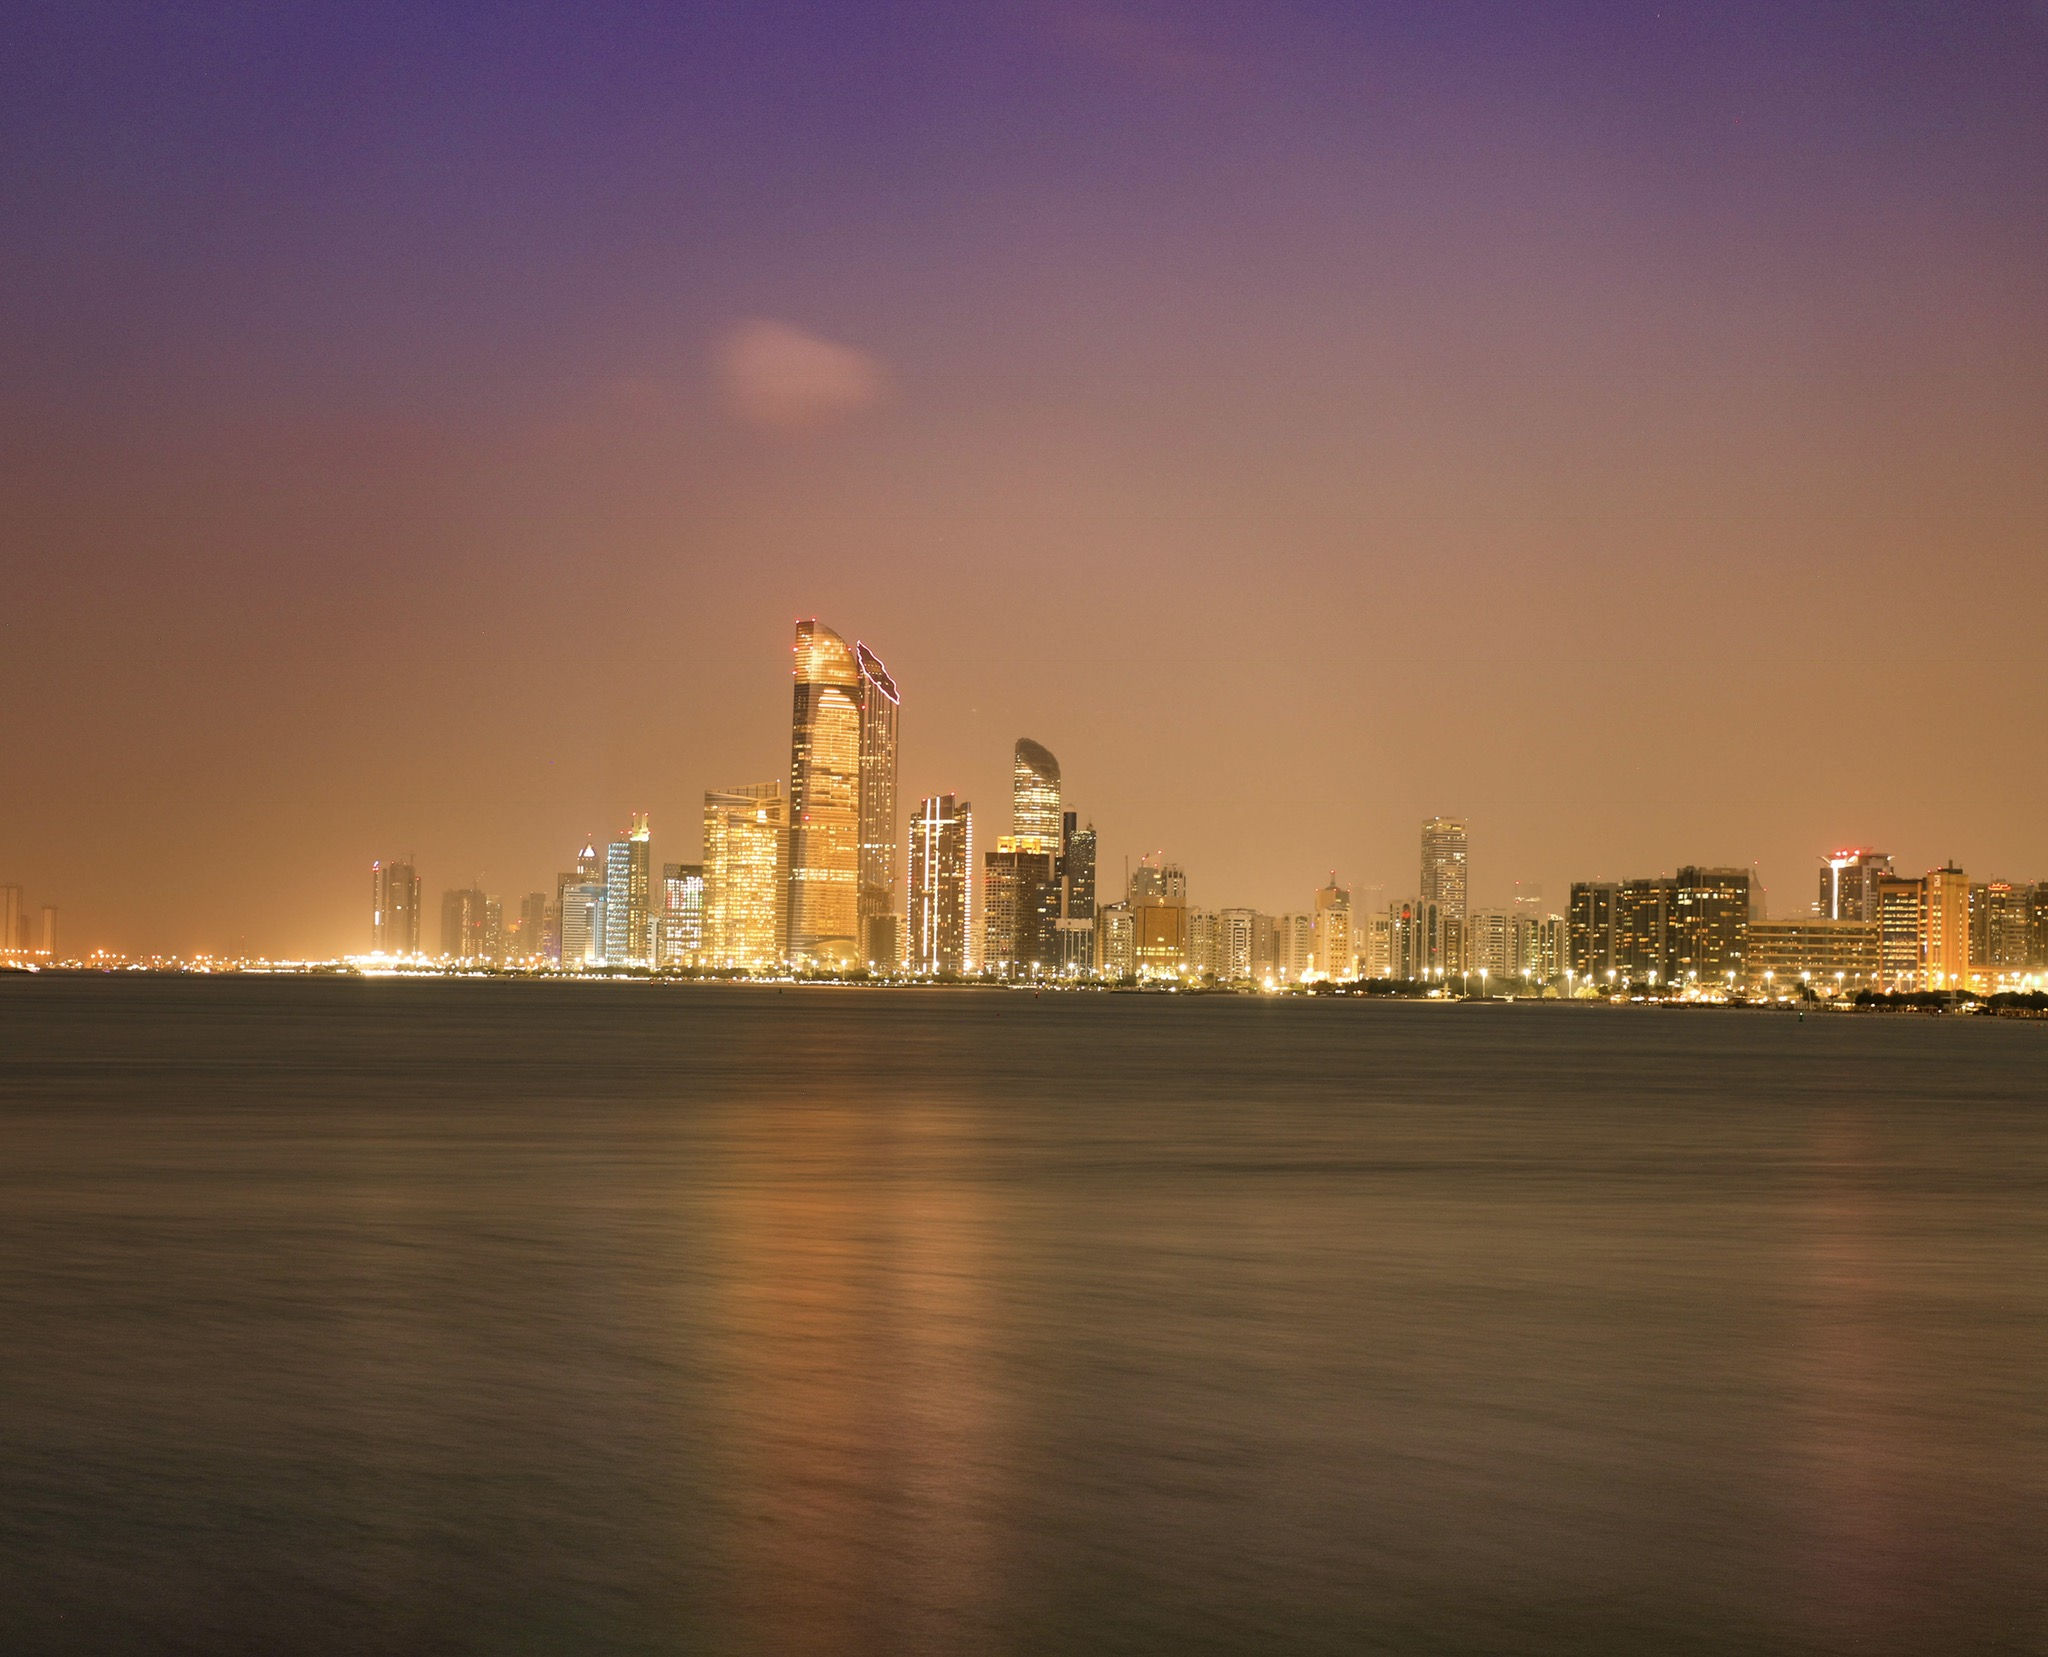 Abu Dhabi corniche, United Arab Emirates